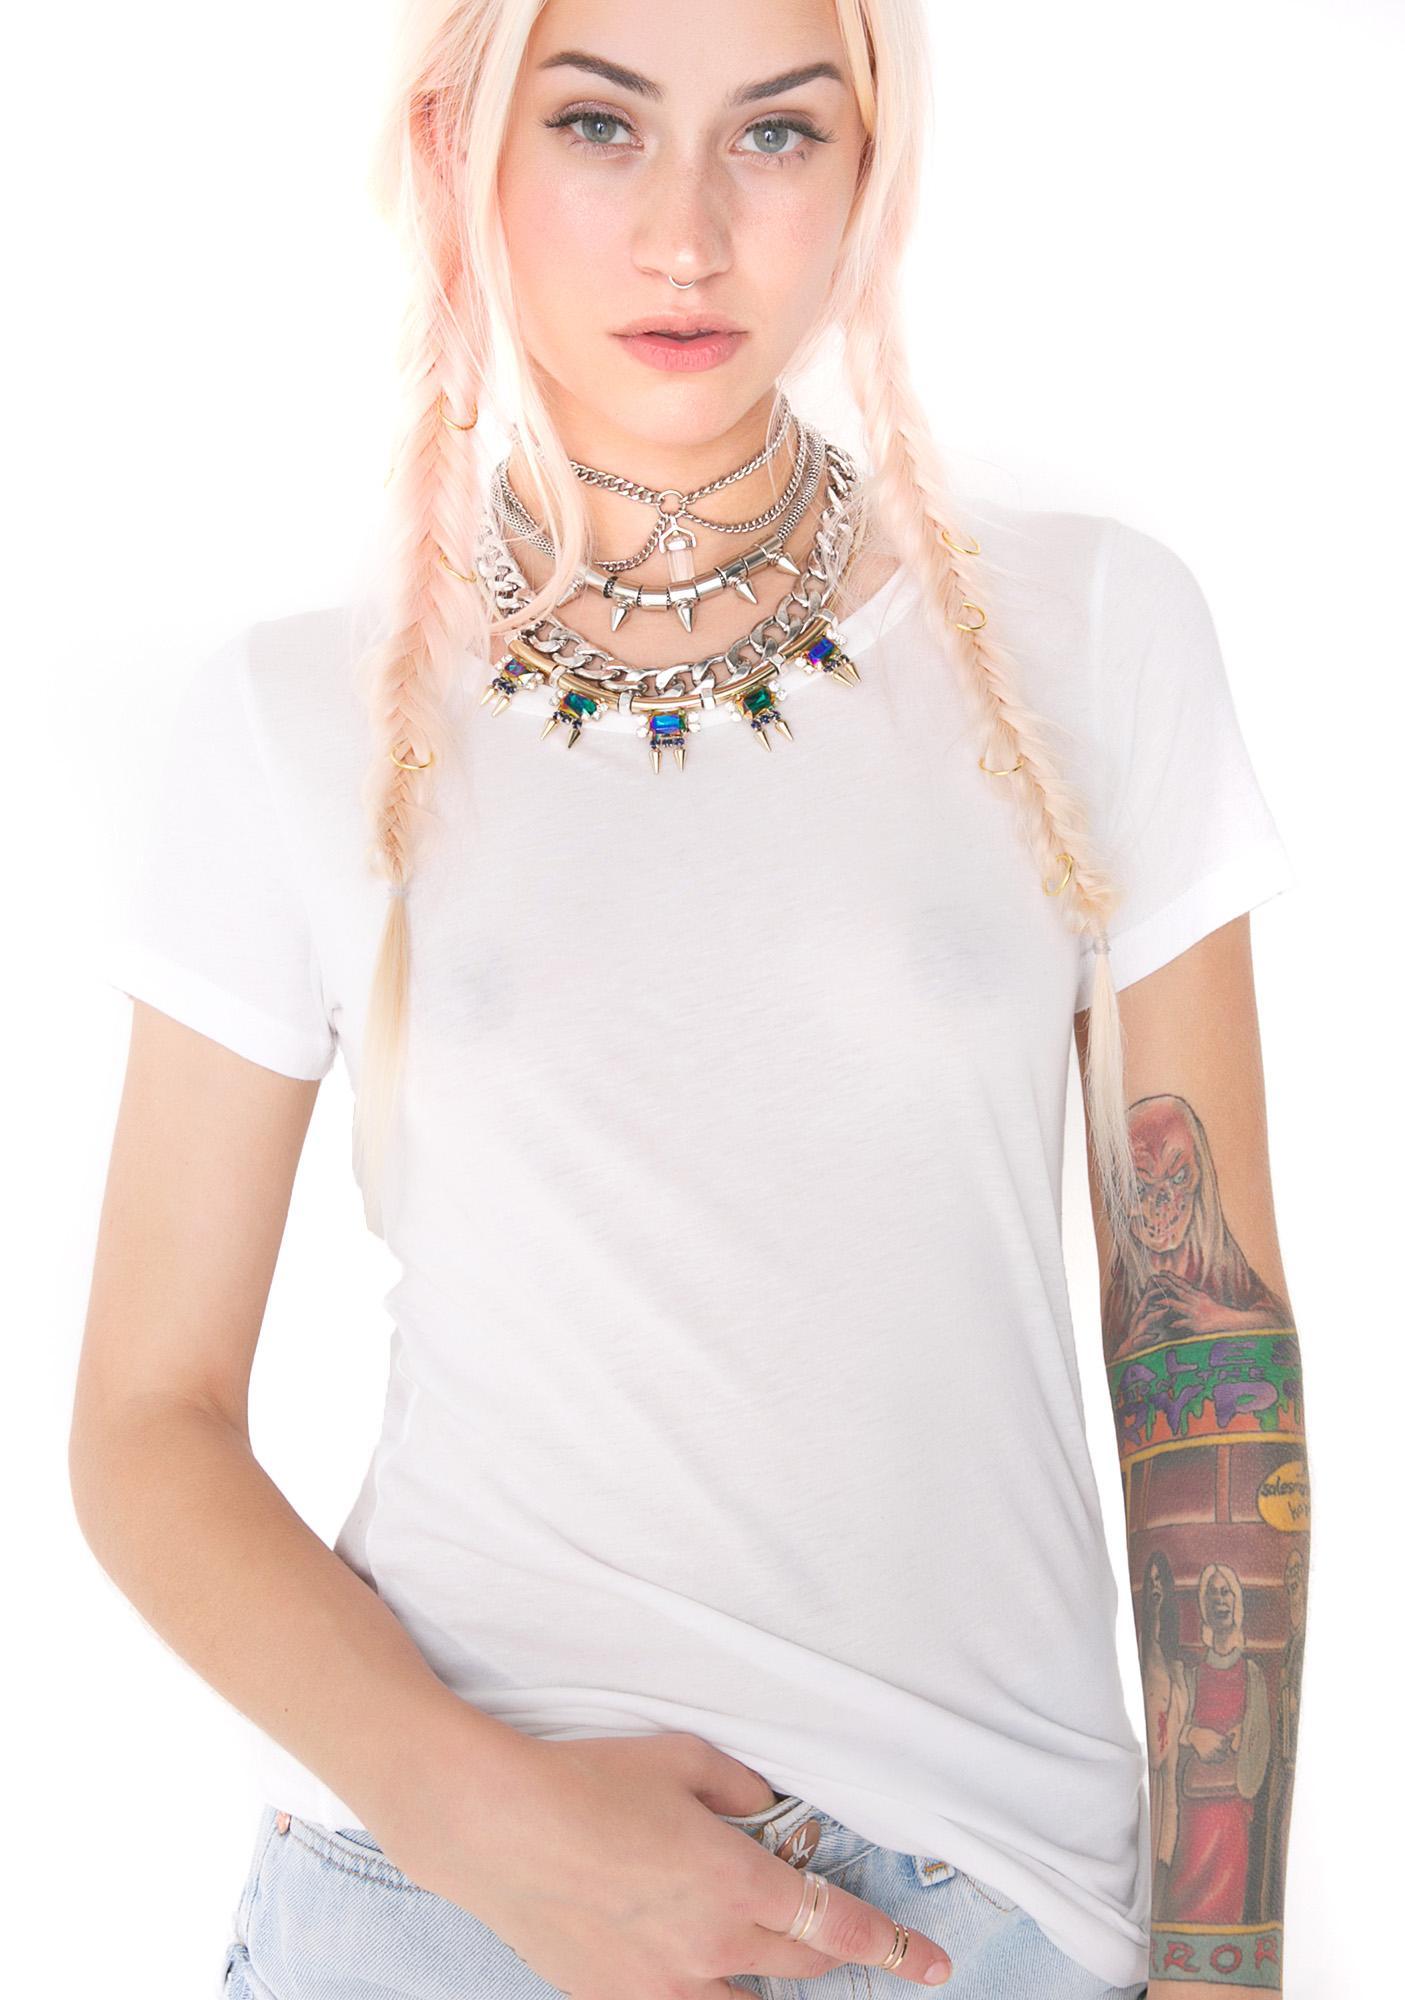 Cygnus Layered Necklace